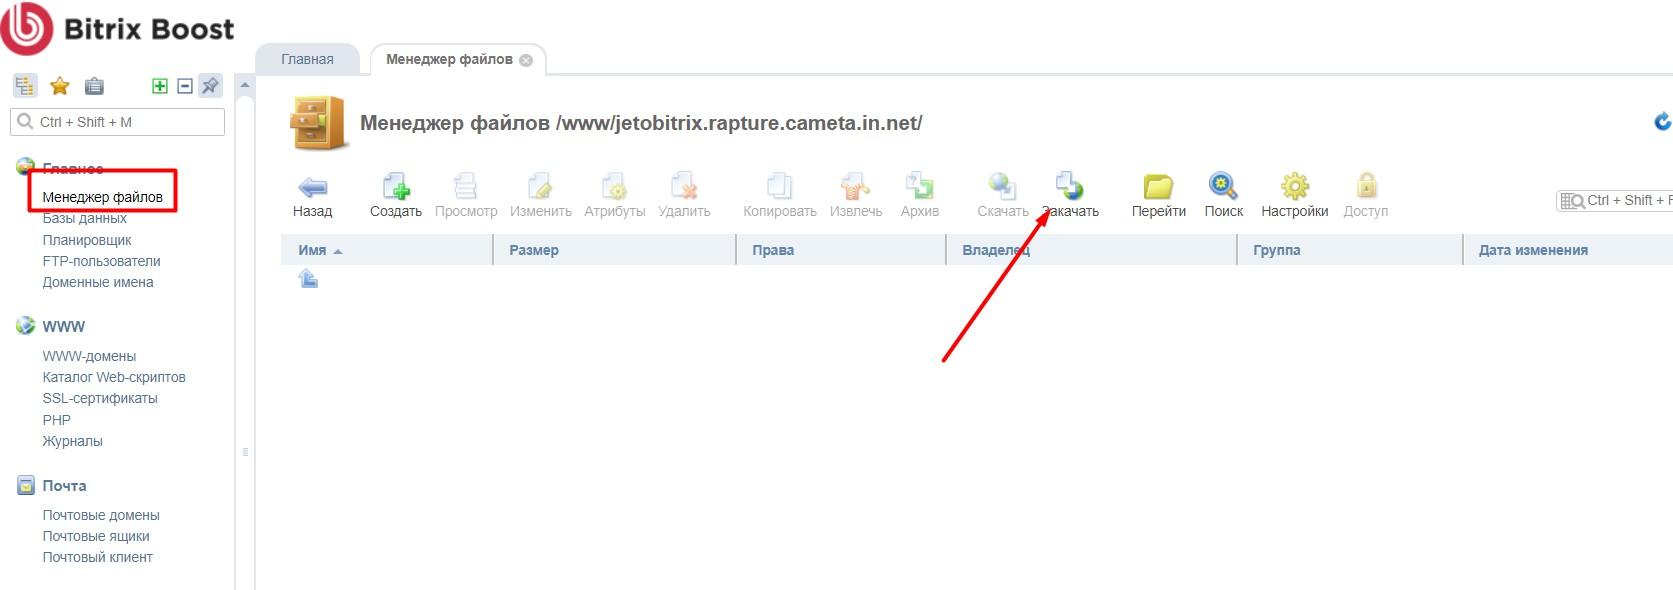 хостинг майнкрафт серверов 1 слот 7 рубля